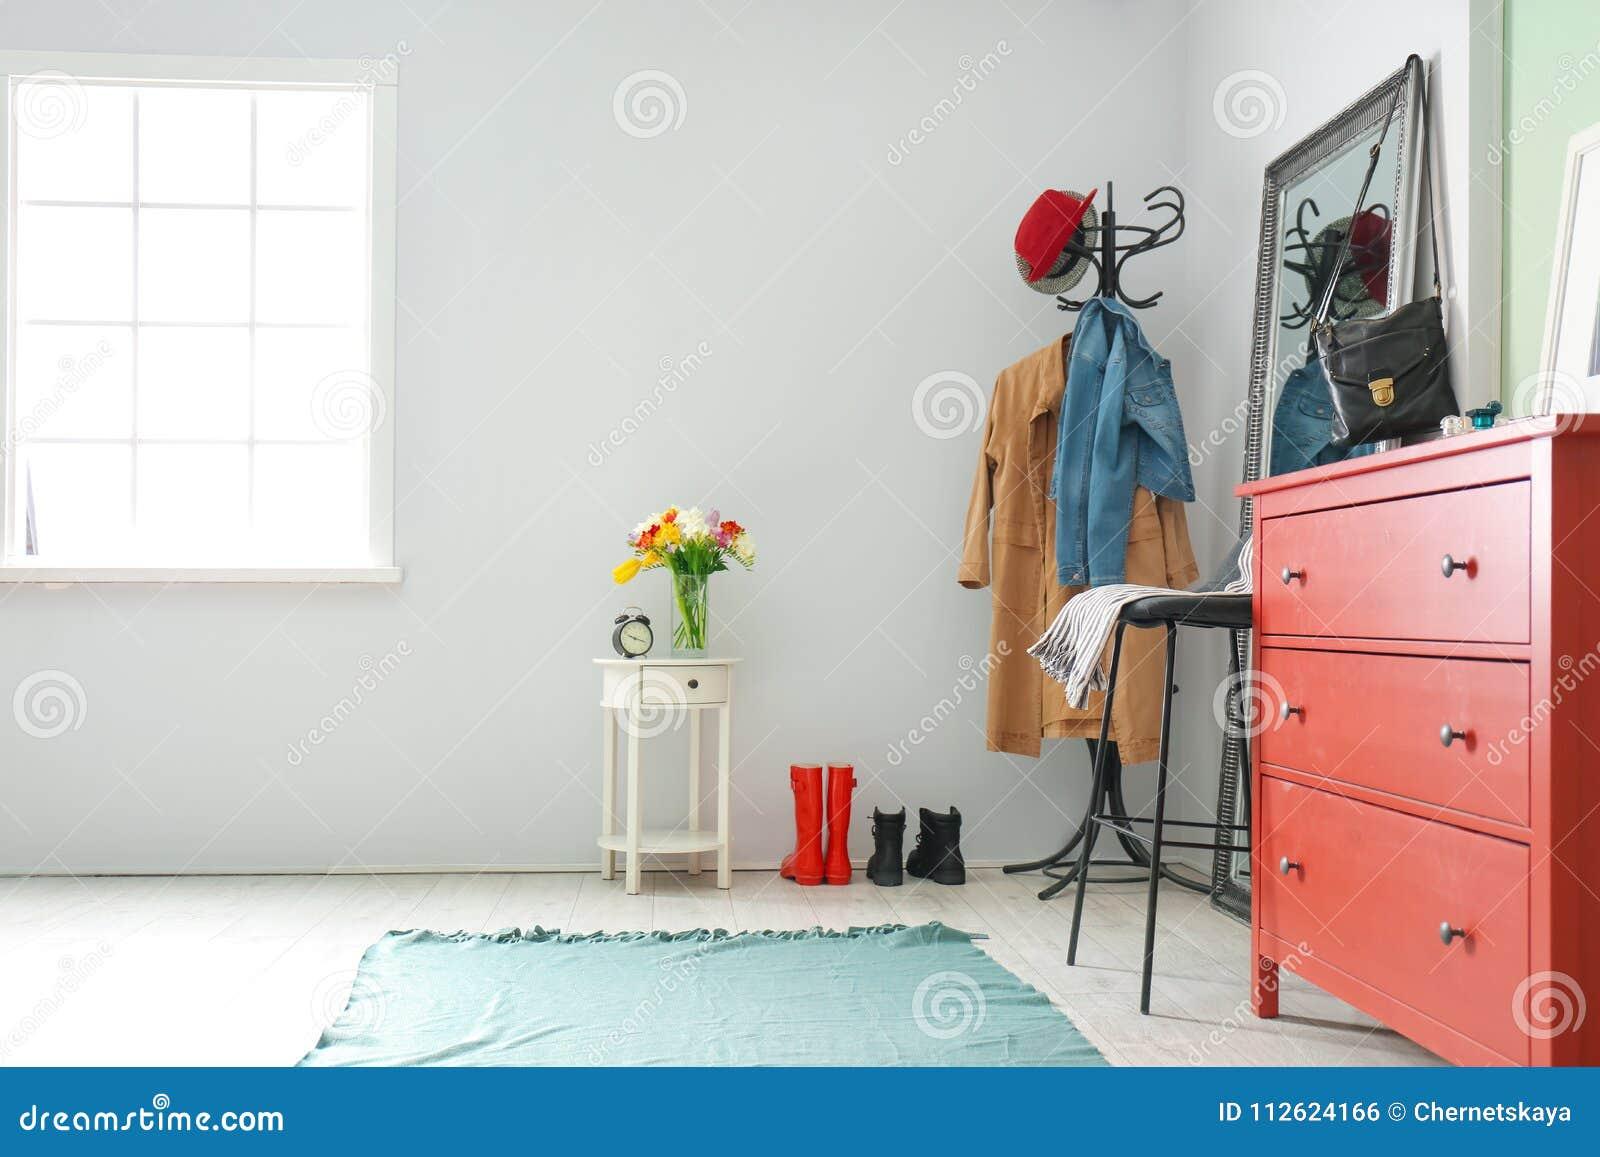 Modern hallway interior with clothes